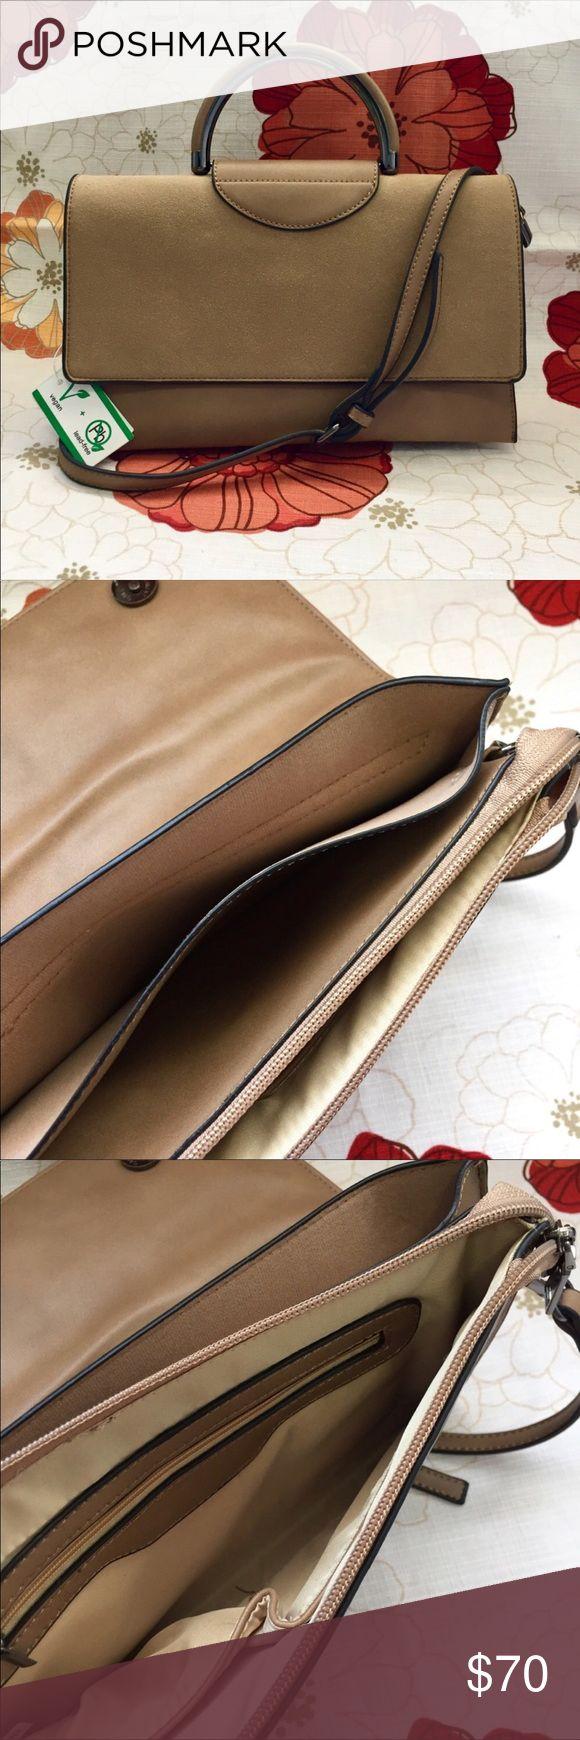 "Mini brief case handbag with strap Mini handbag with shoulder strap   ~ Compartment 1: No closure, No pockets ~ Compartment 2: Zip closure, one zip and two slip pockets  ~ Maximum shoulder strap length: 19"" snap closure ~ 11""W x 7""H x 2""D Nordstrom Bags"